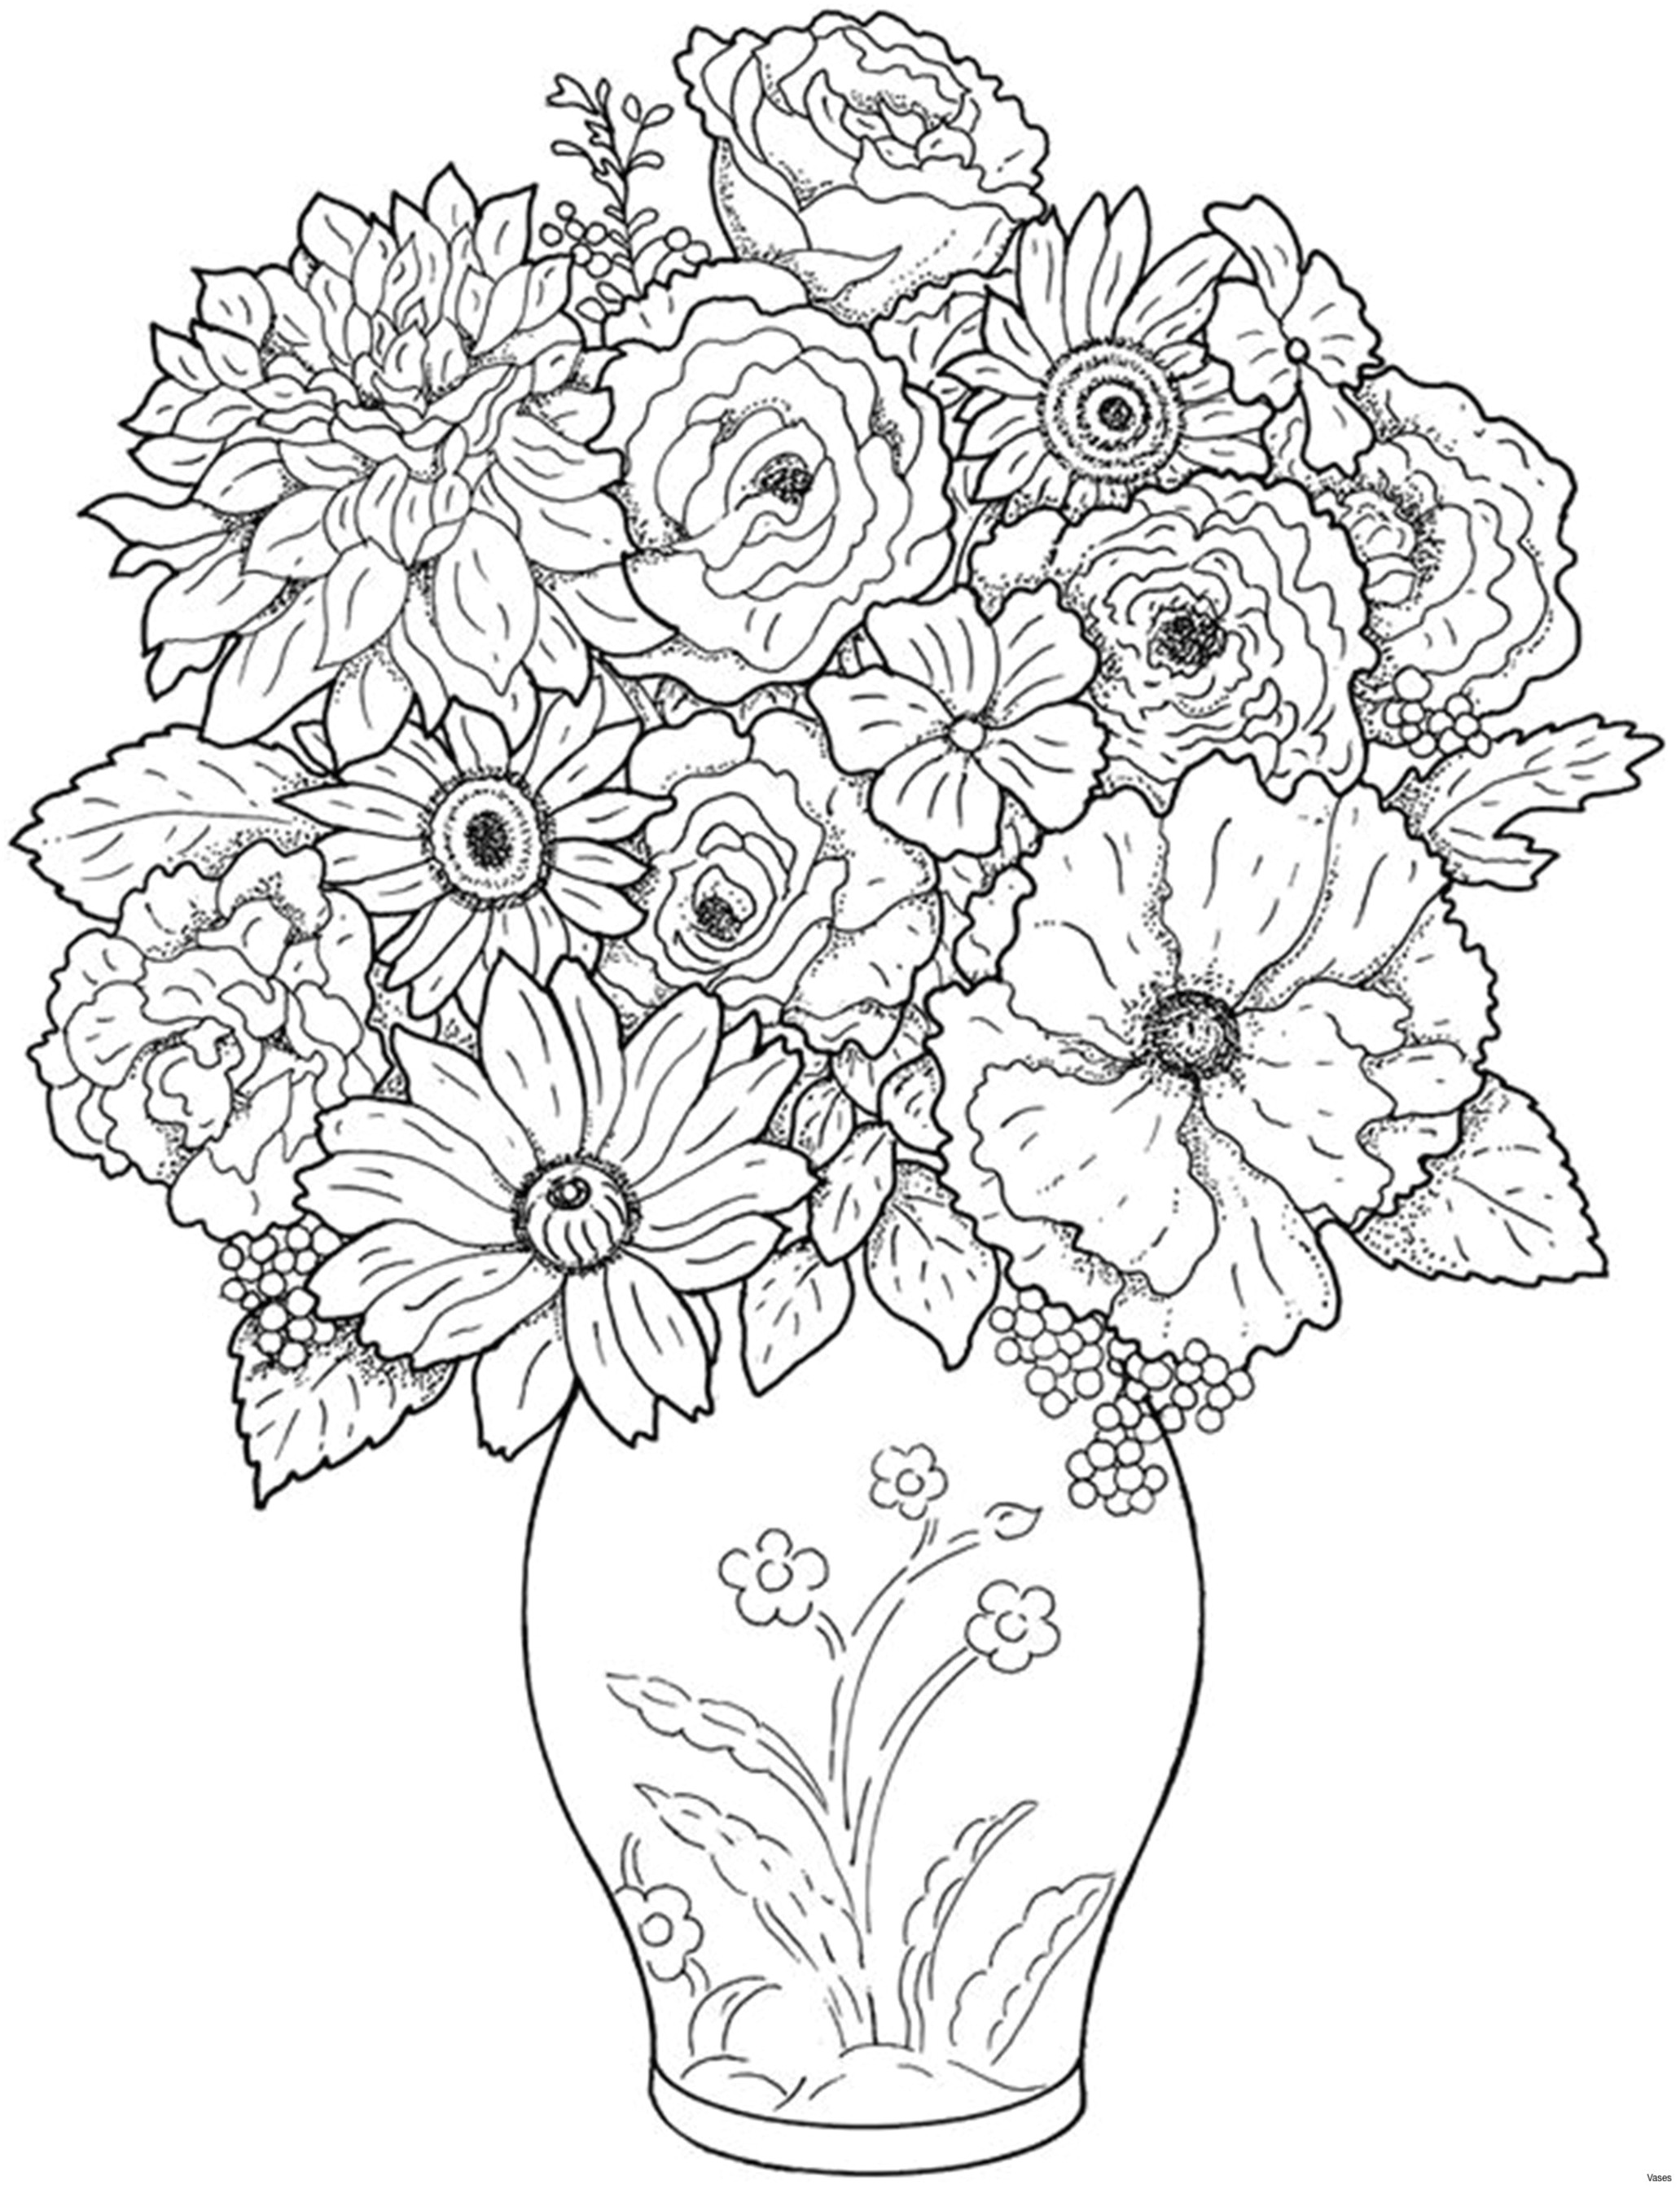 flowers coloring pages best vases flower vase coloring page pages flowers in a top i 0d